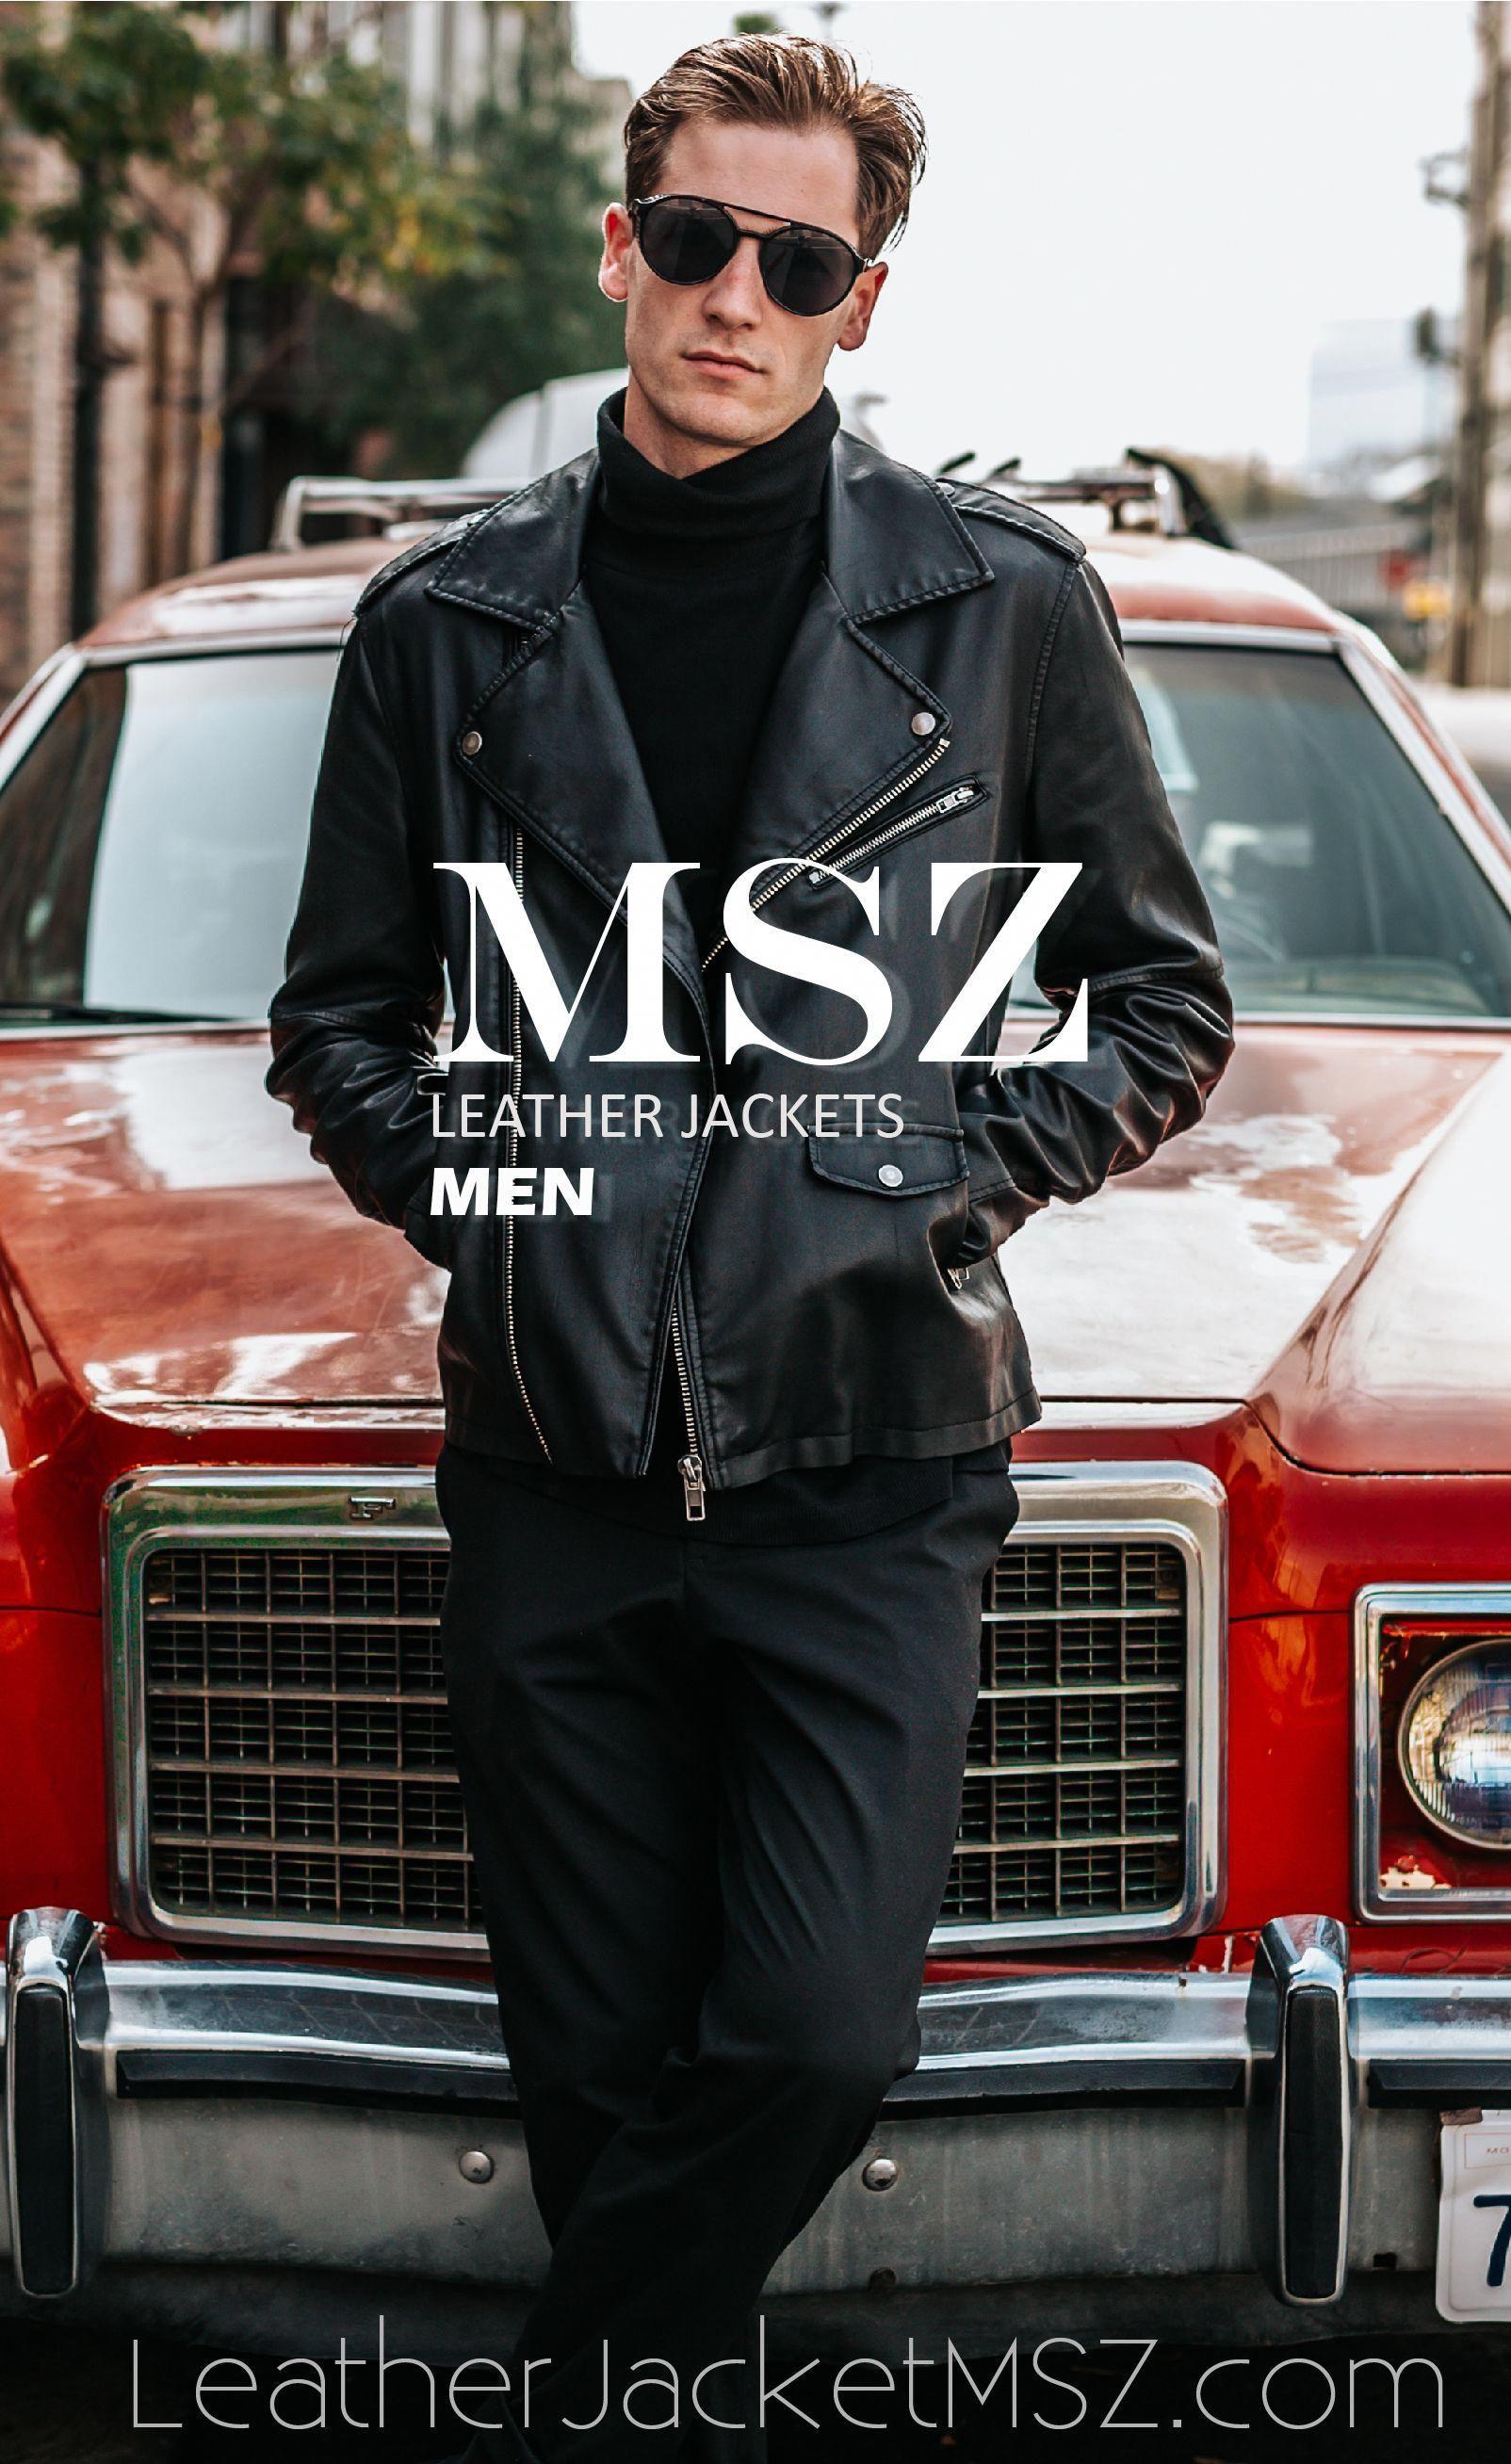 Leather Jacket For Men leatherjacketsformenbrown